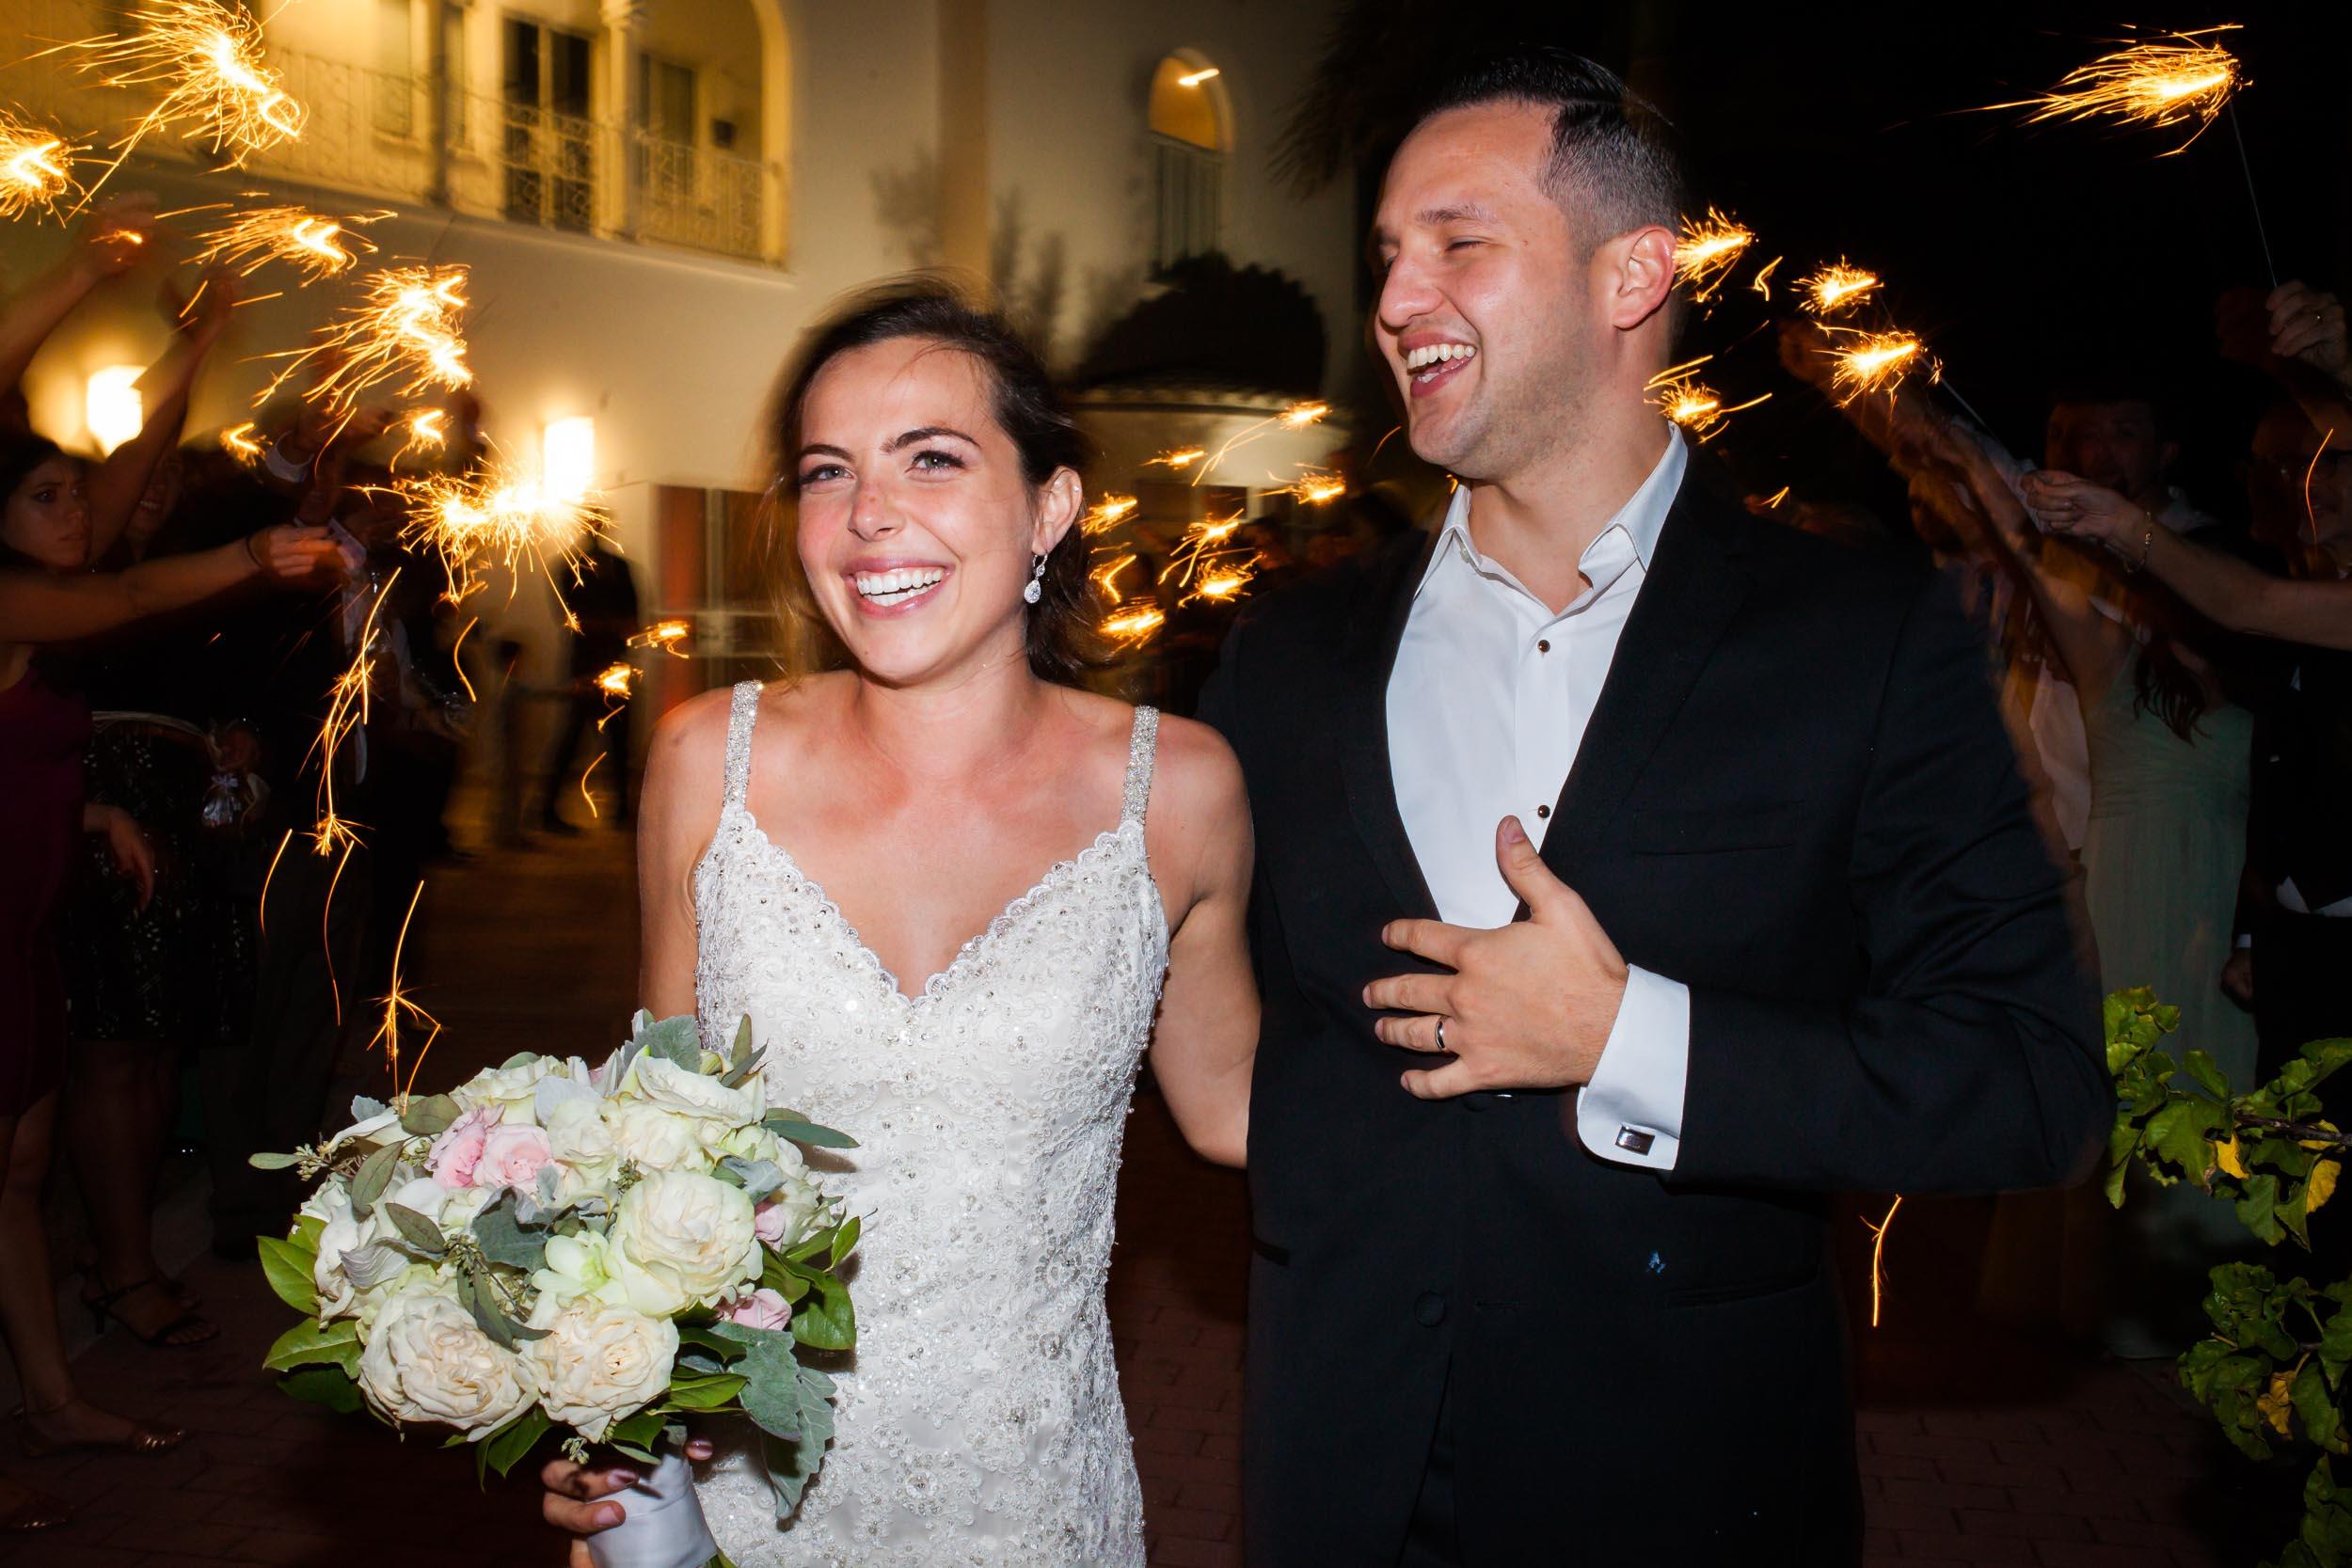 Flordia-Wedding-Photography-89.jpg